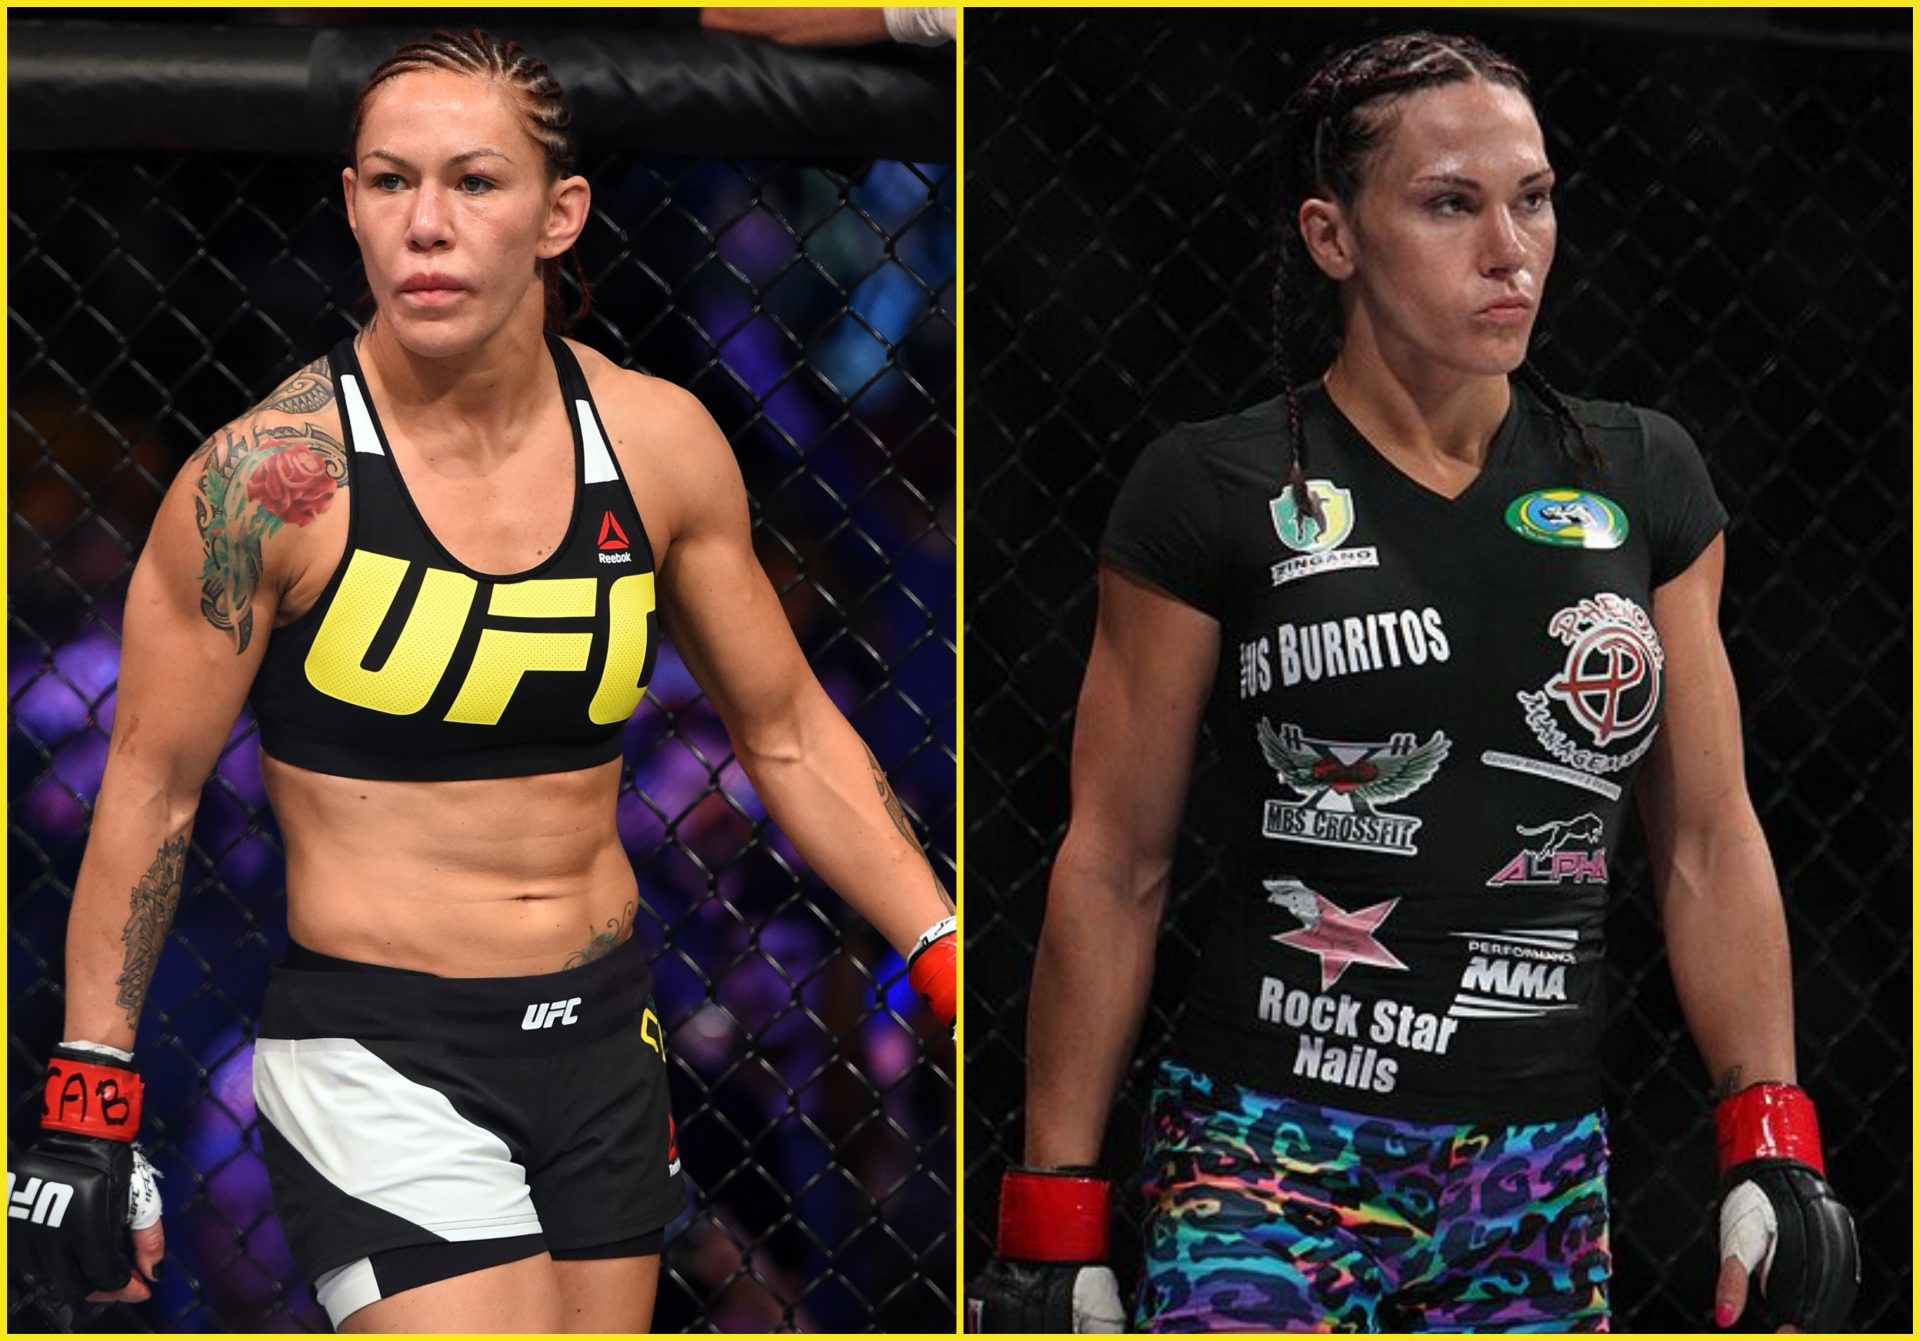 Bellator women's featherweight champion Cris Cyborg willing to fight Cat Zingano - Cyborg